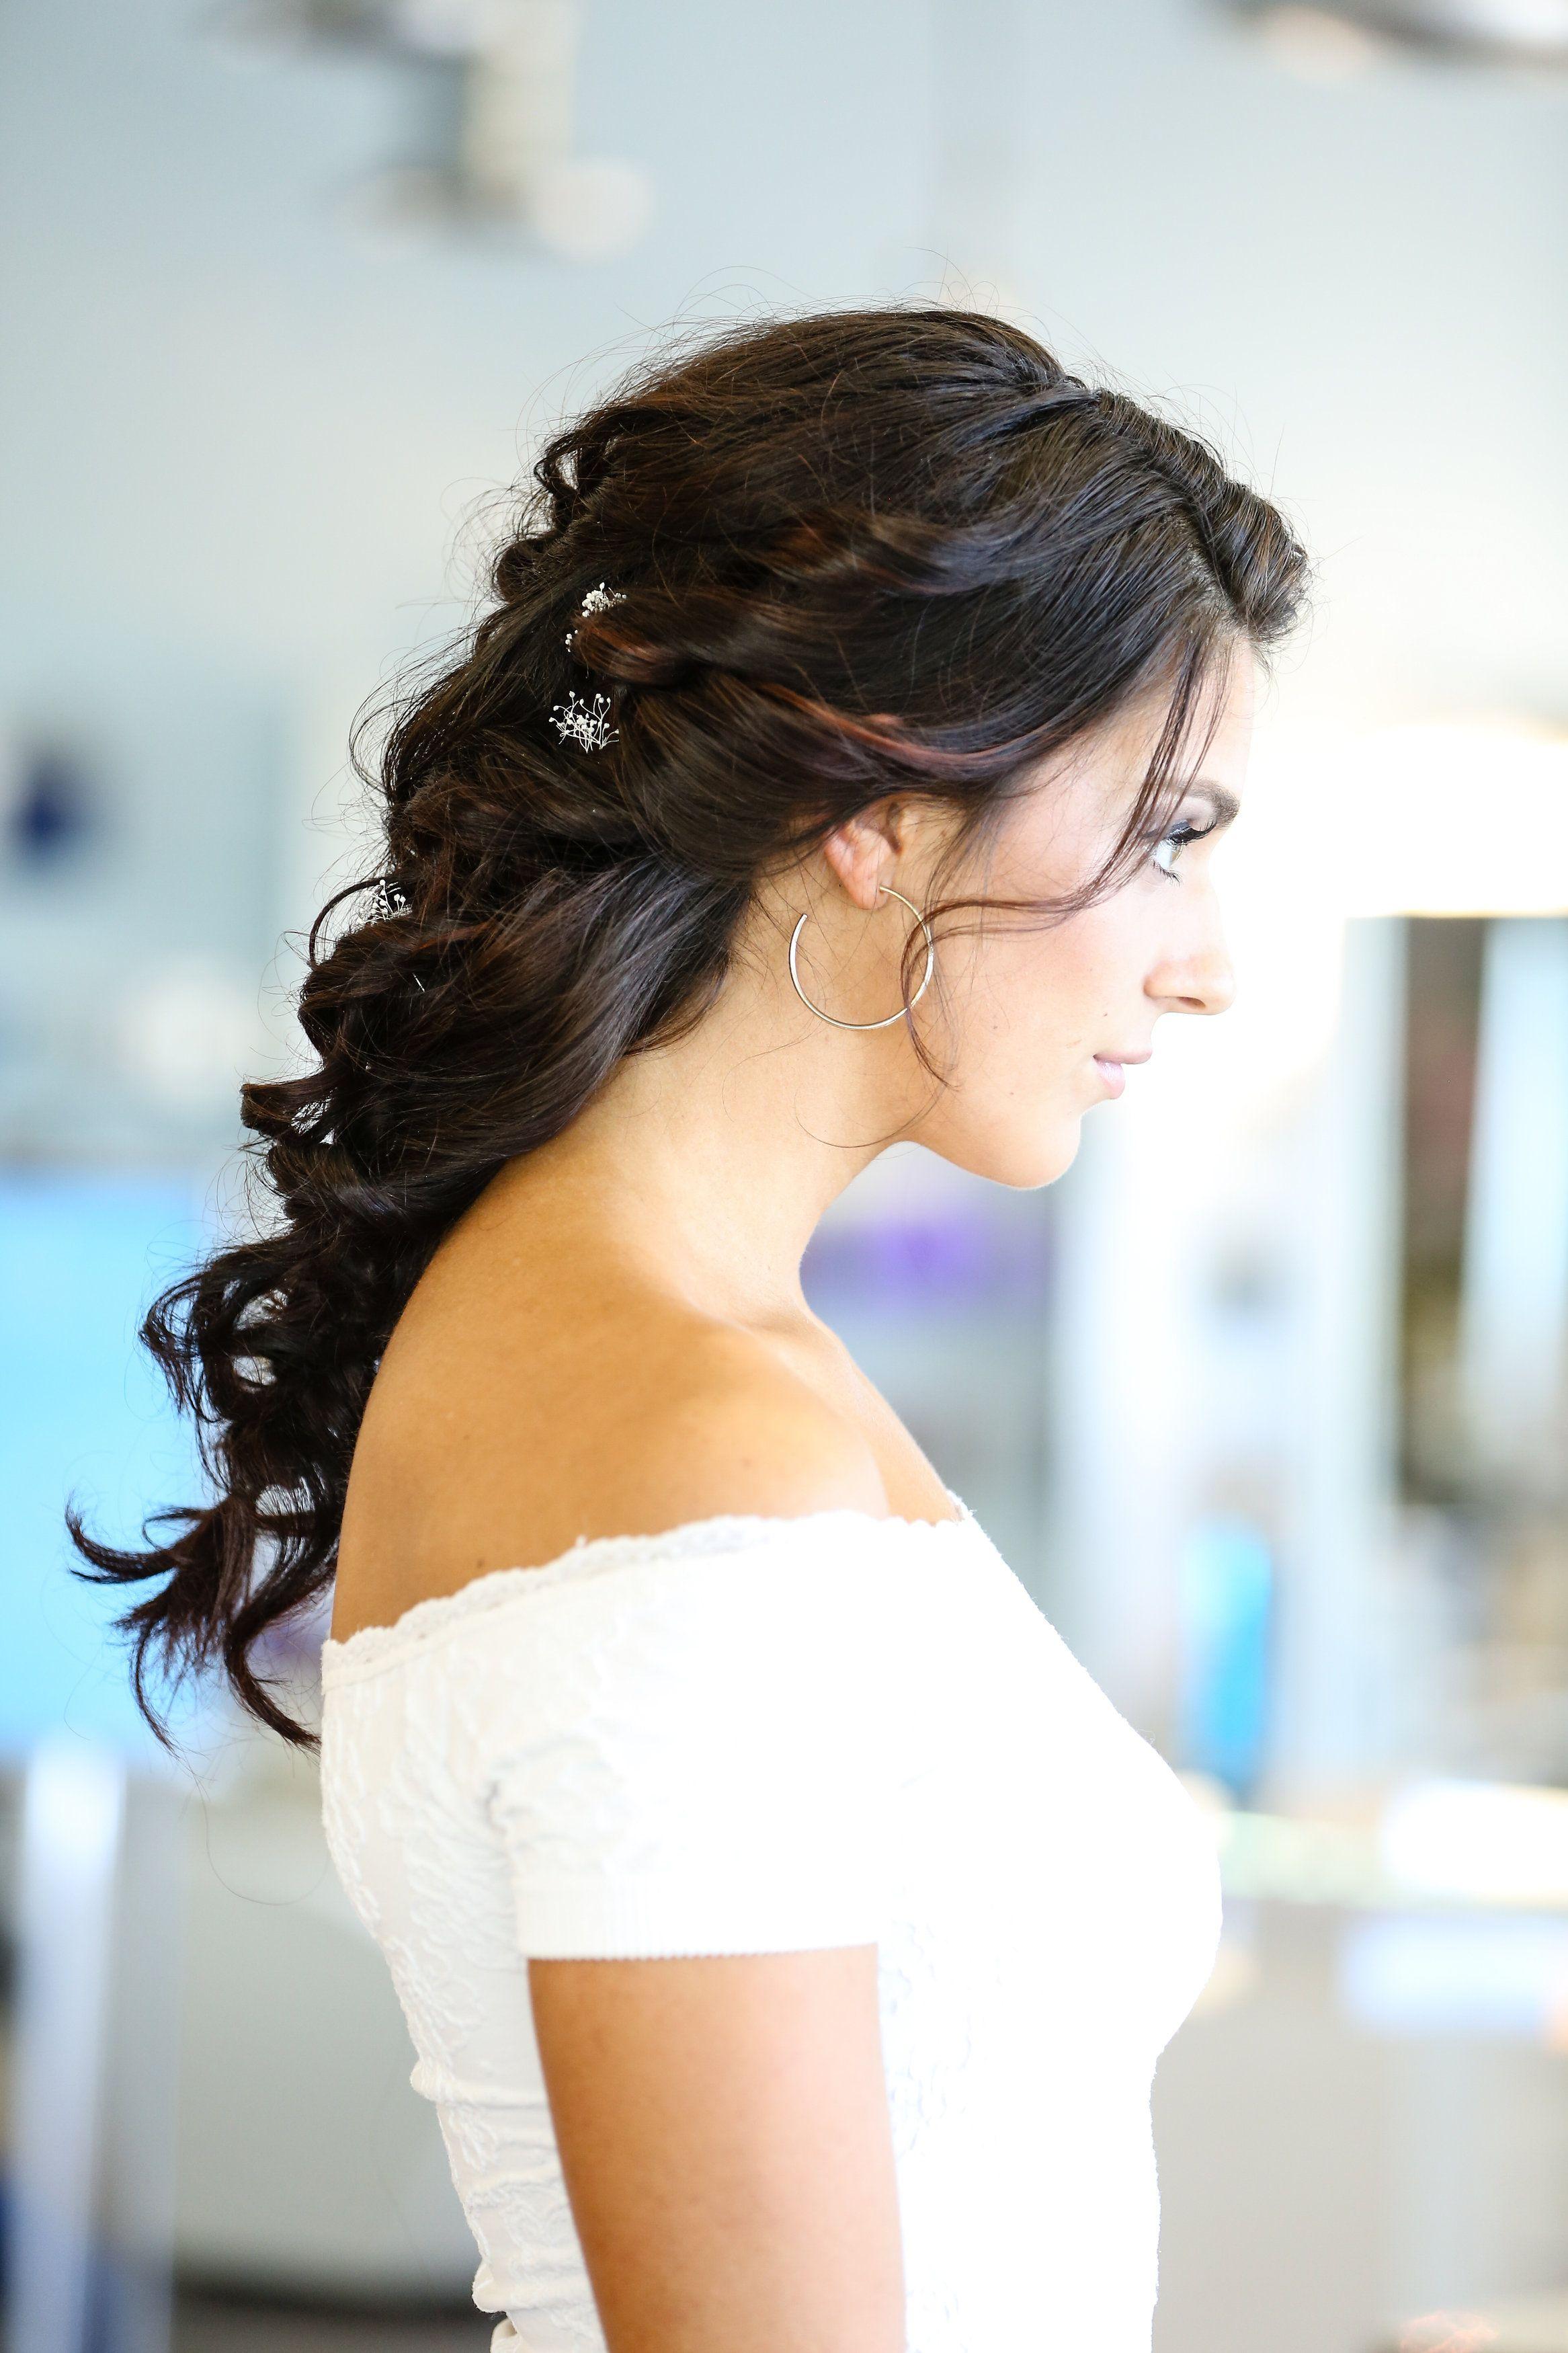 Hair Salon Boca Raton Boca Hair Salons Salon Sora Best Hair Salon Womens Haircuts Womens Hairstyles